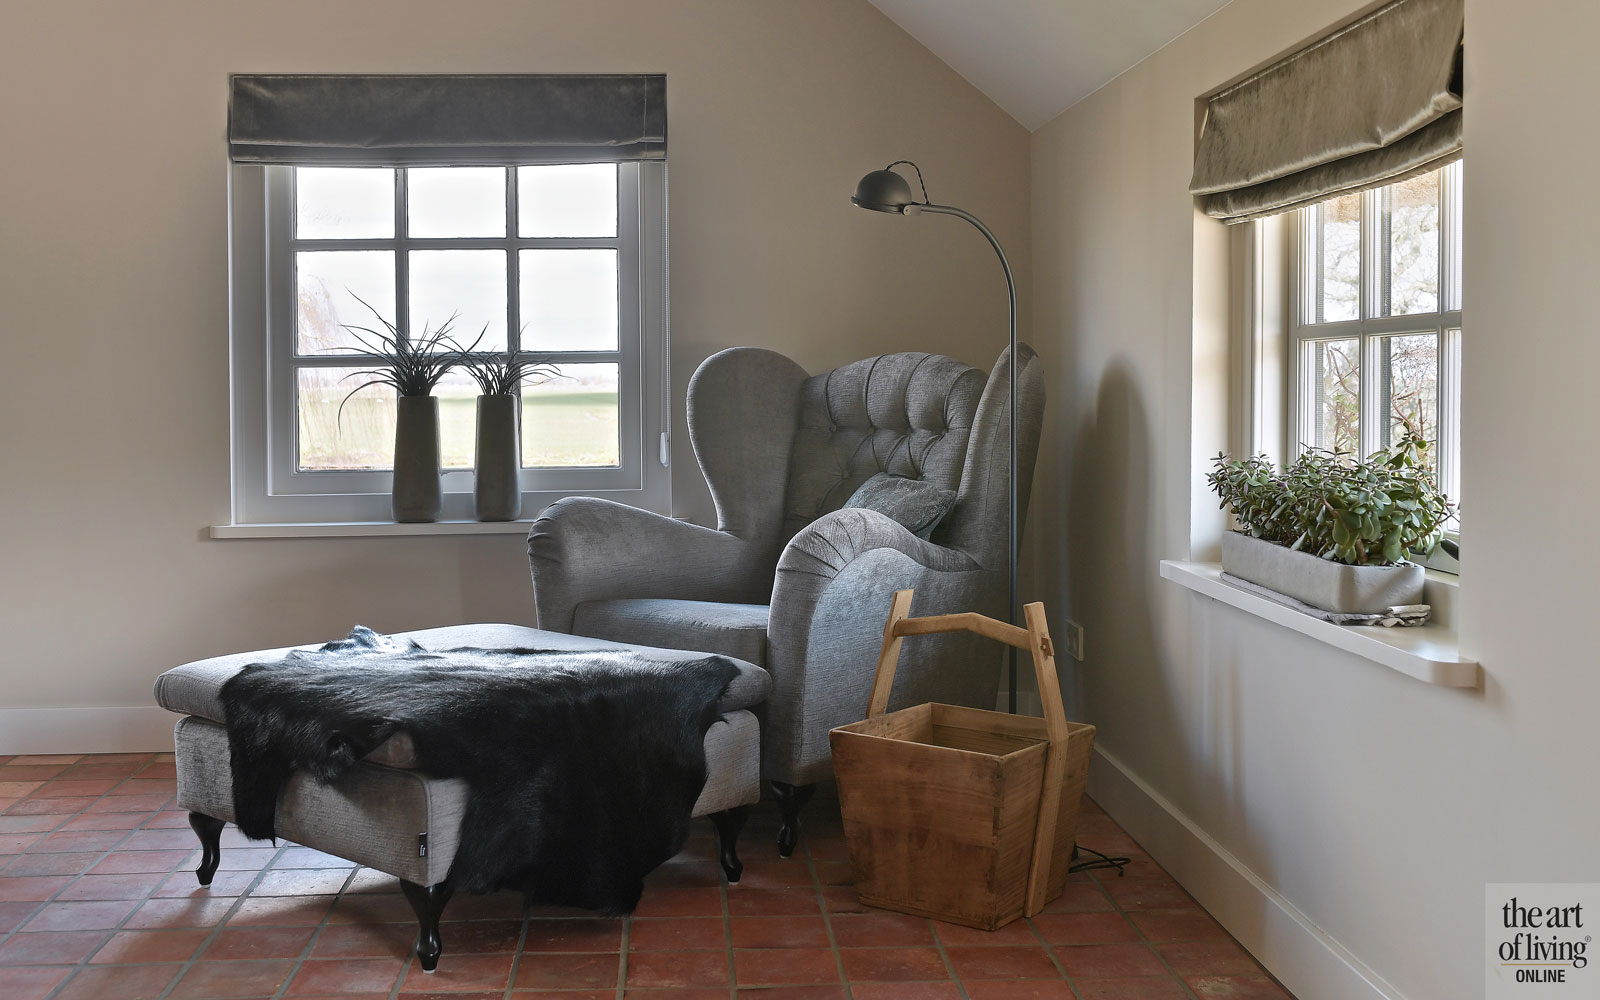 Lounge chair, stoel, ontspannen, tegelvloer, landelijk, modern, Hemels Wonen